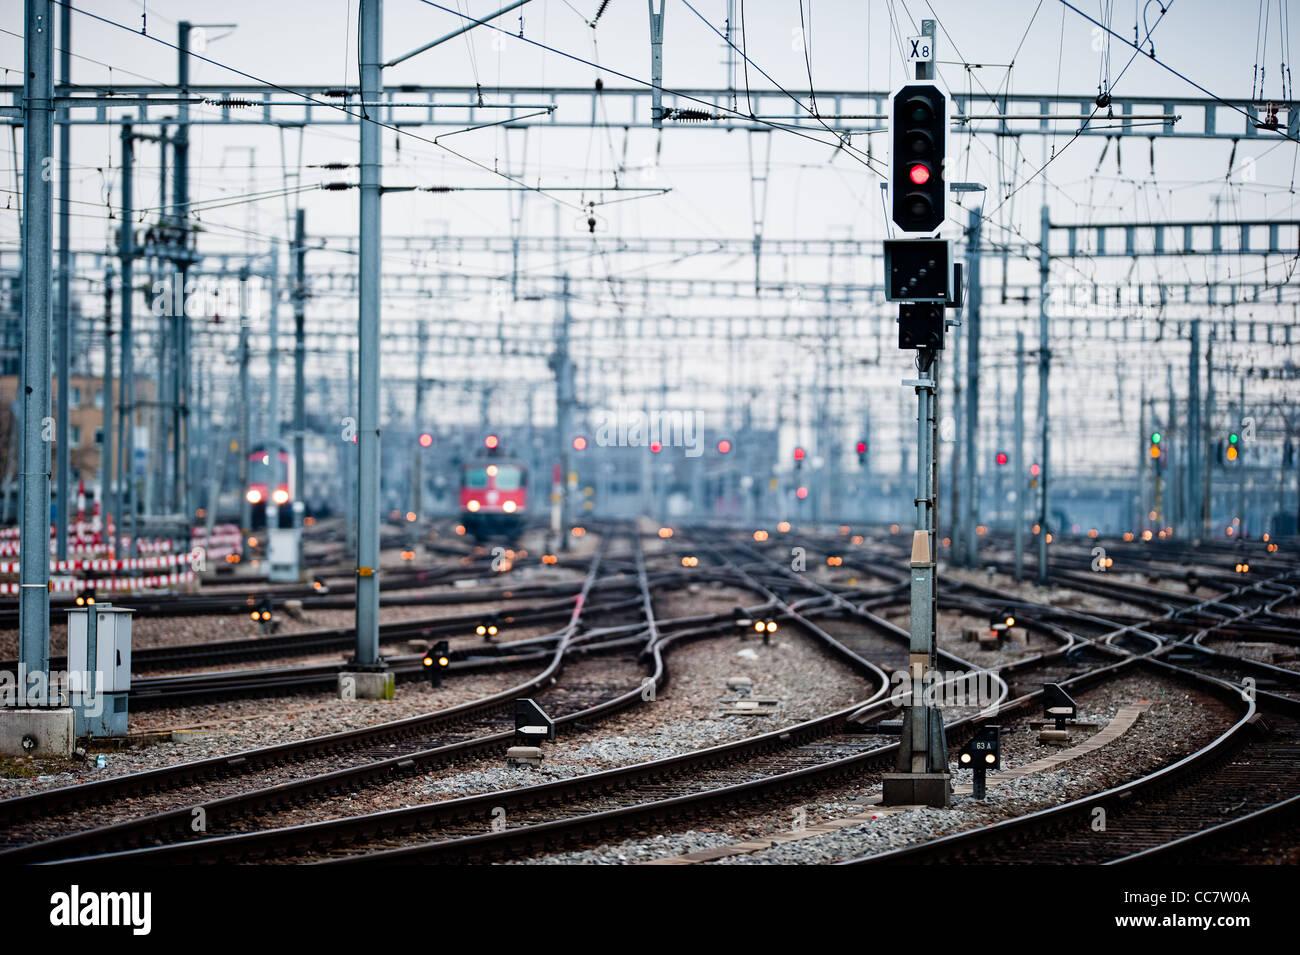 Railway lines at Zuerich main station vanishing into distant blur (low dof), Zuerich Switzerland - Stock Image